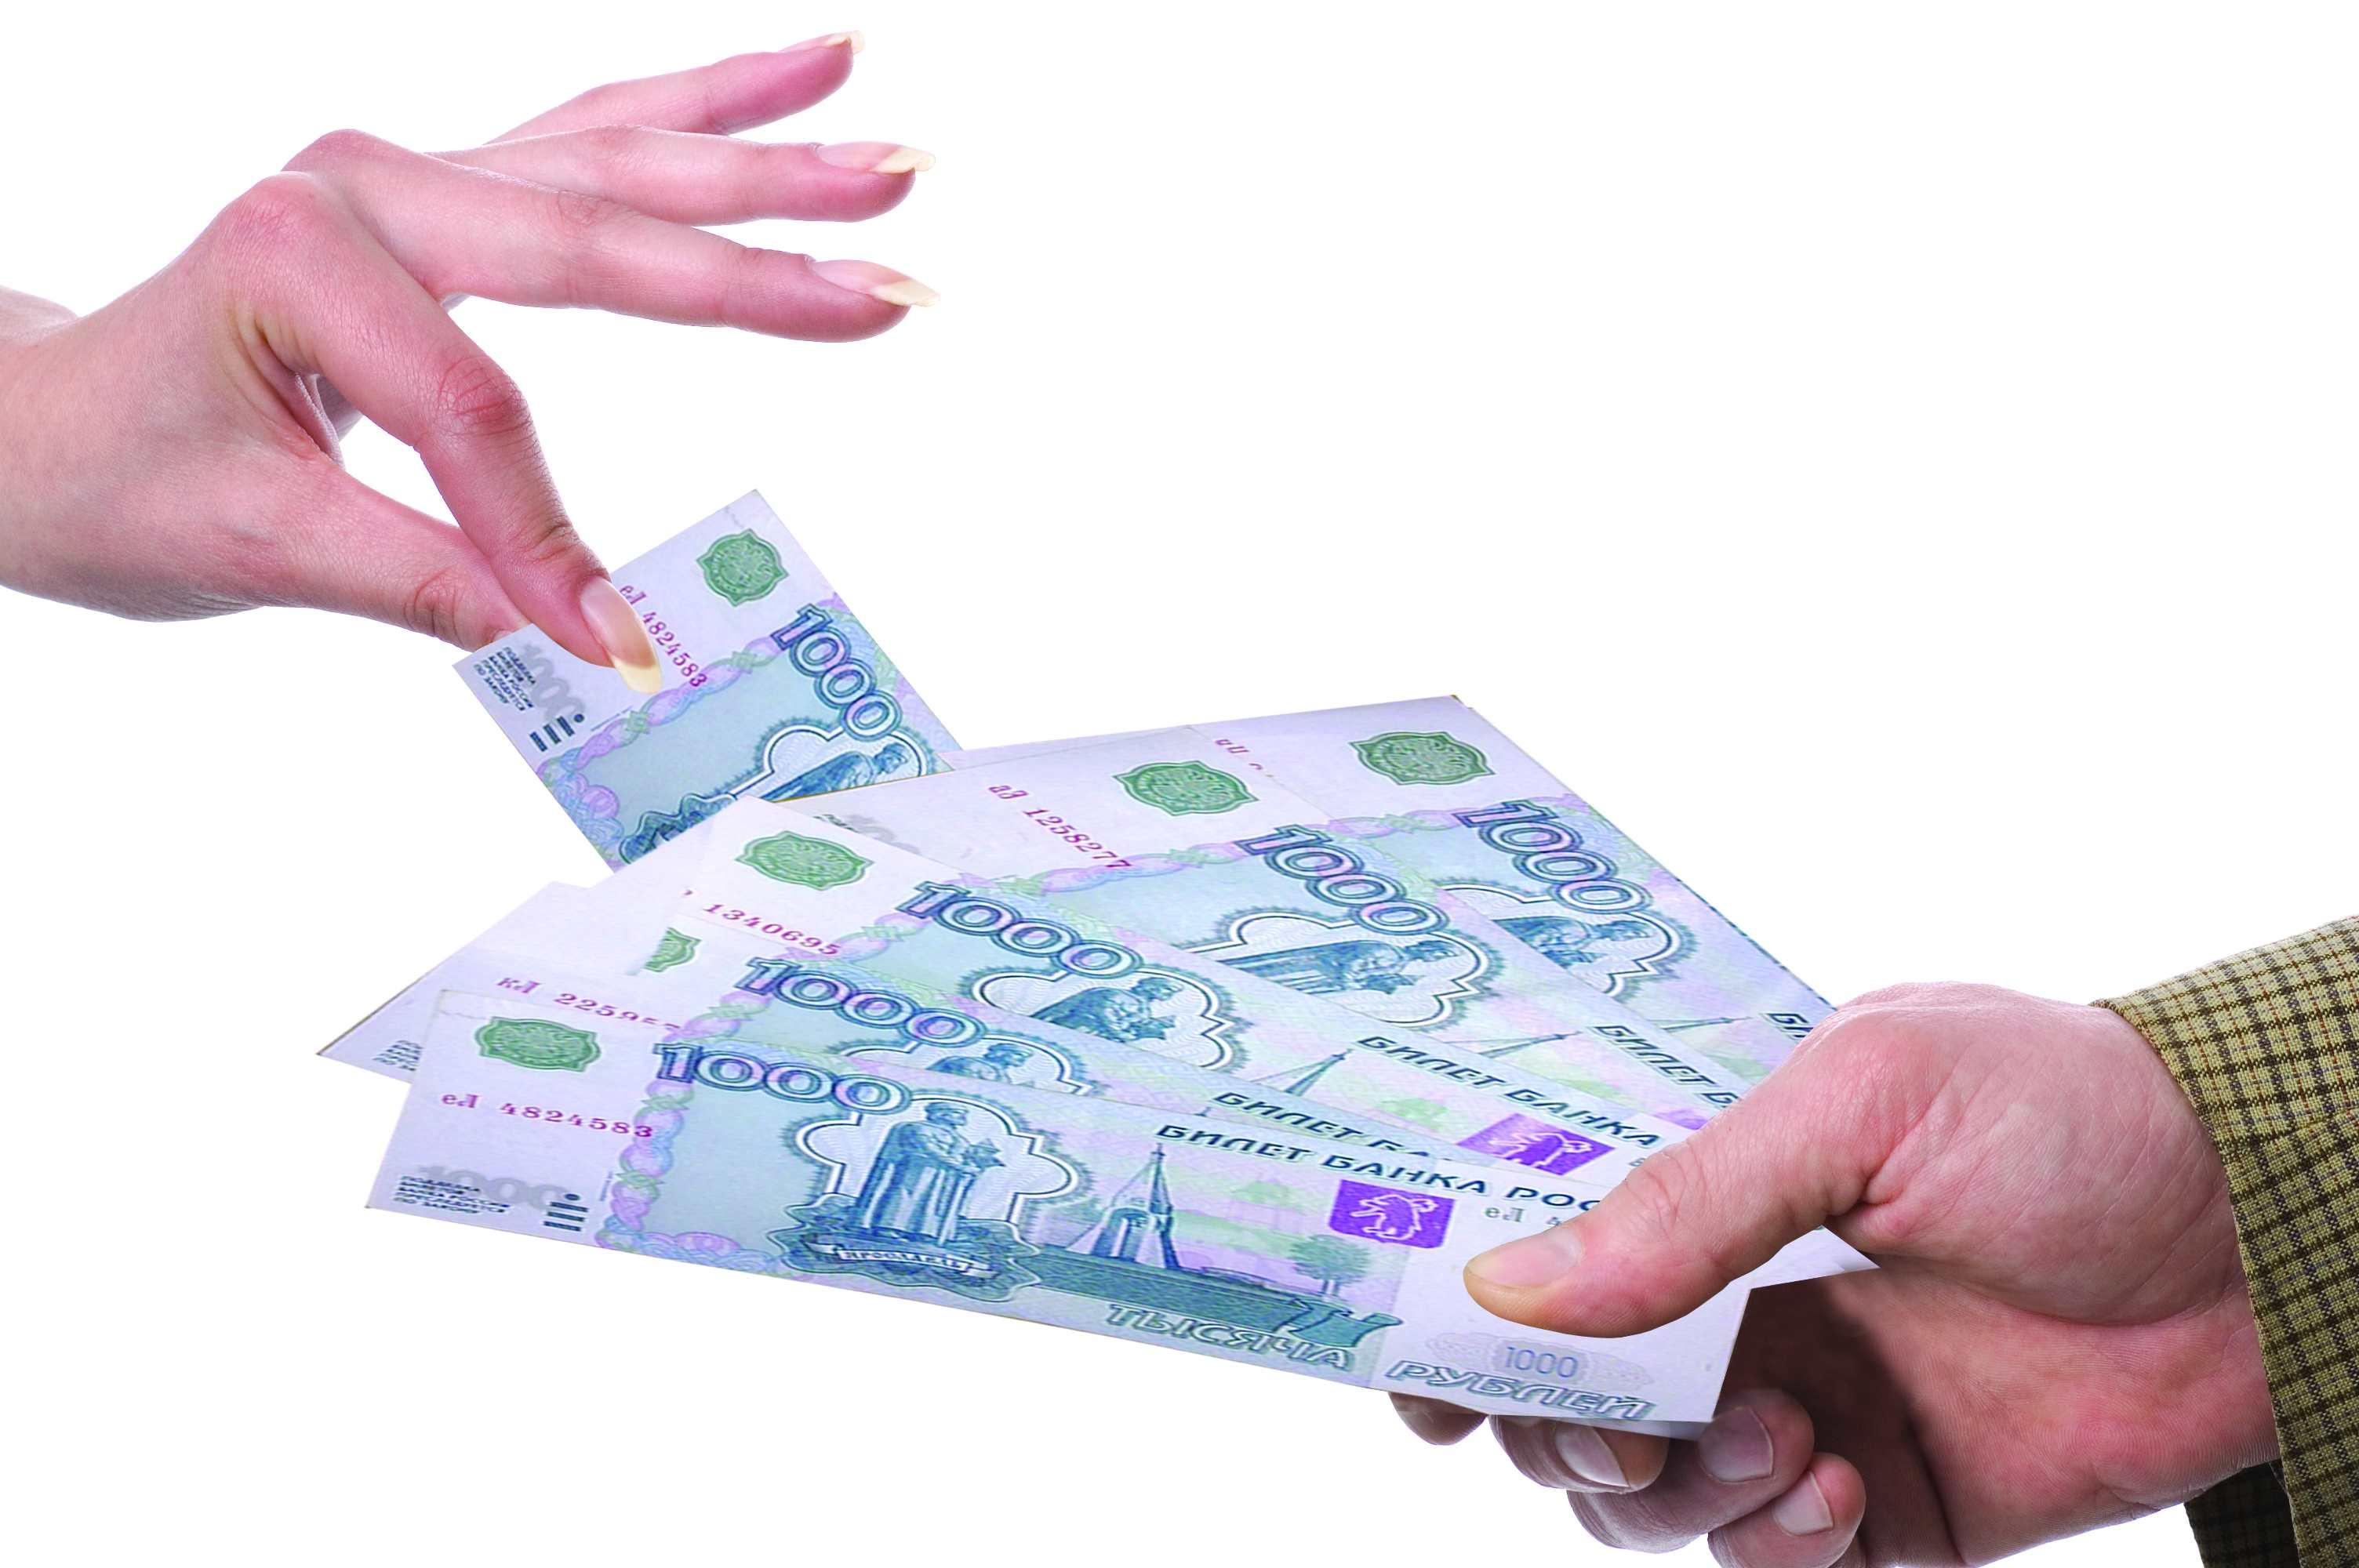 вятка банк кредит наличными